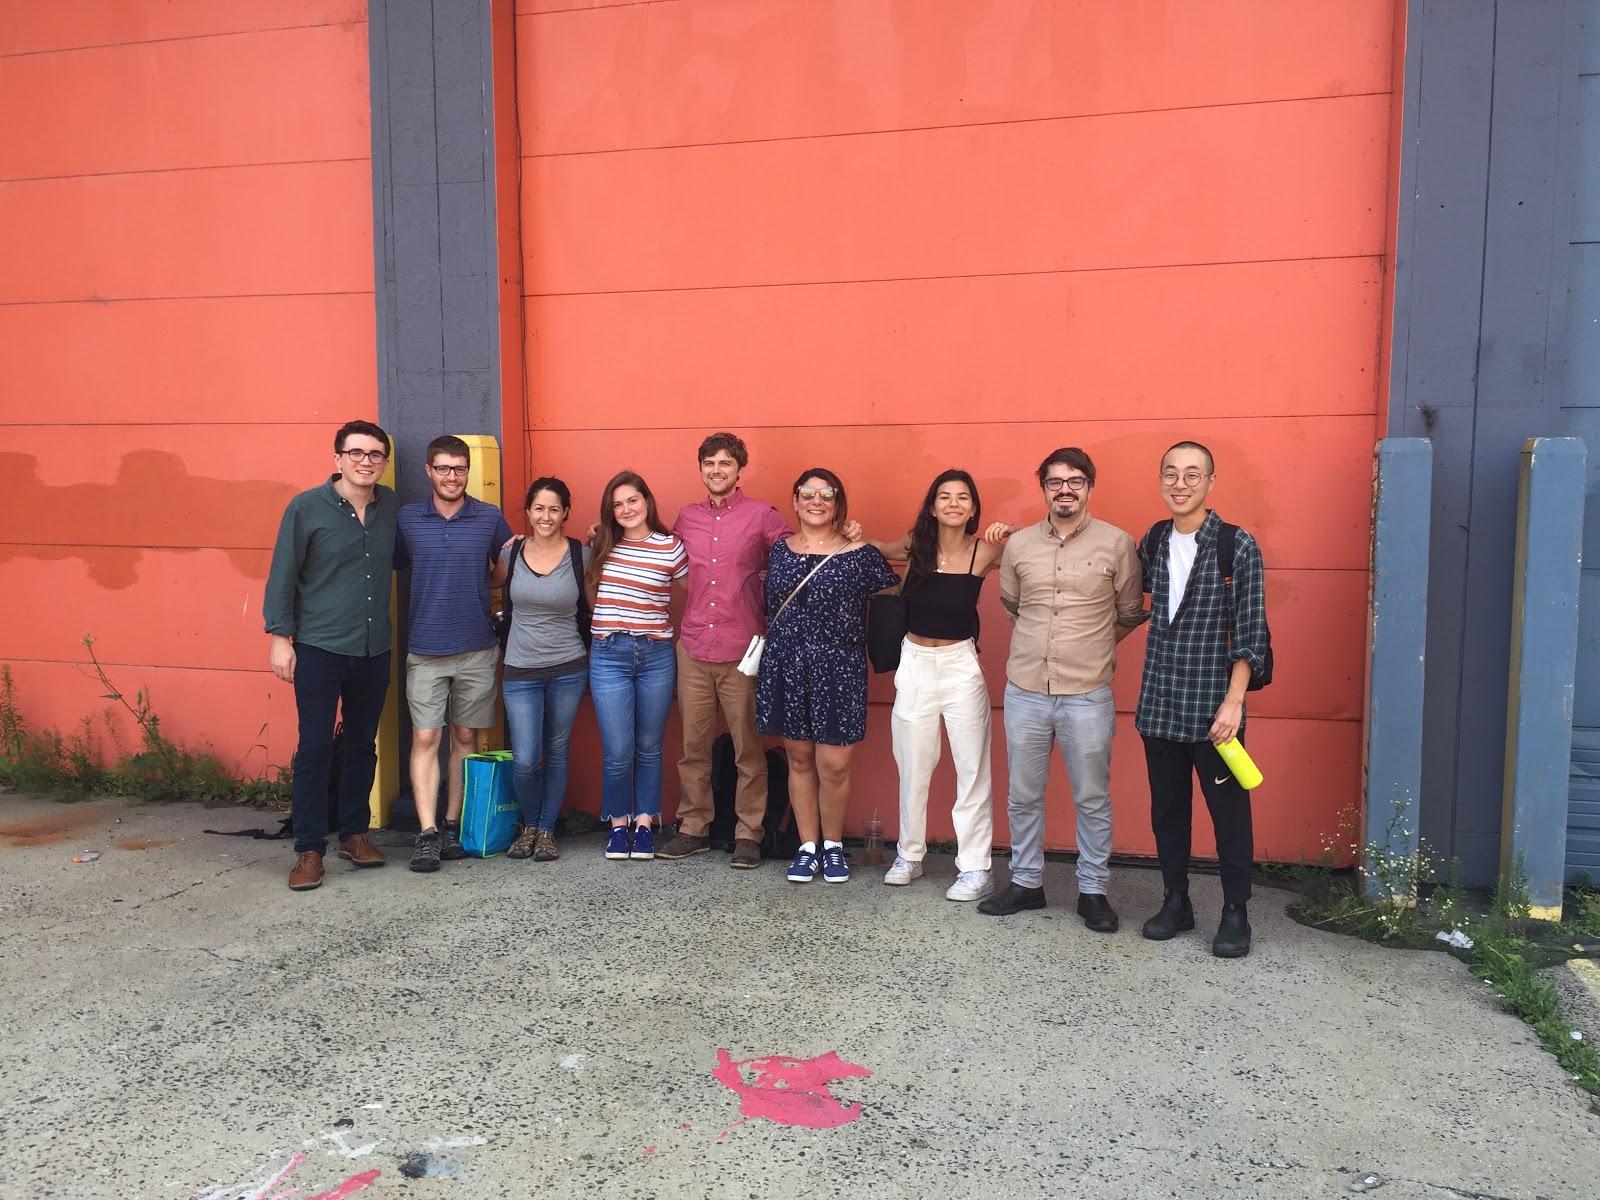 Photo (From left to right): Christian Kanlian '20, Jacob Mark Holley, Yolanda Gonzalez, Katherine Rogers '20, Sam Anderson, Maya Ezzeddine, Mason Leist '20, Wythe Marschall, Brian Byun '19